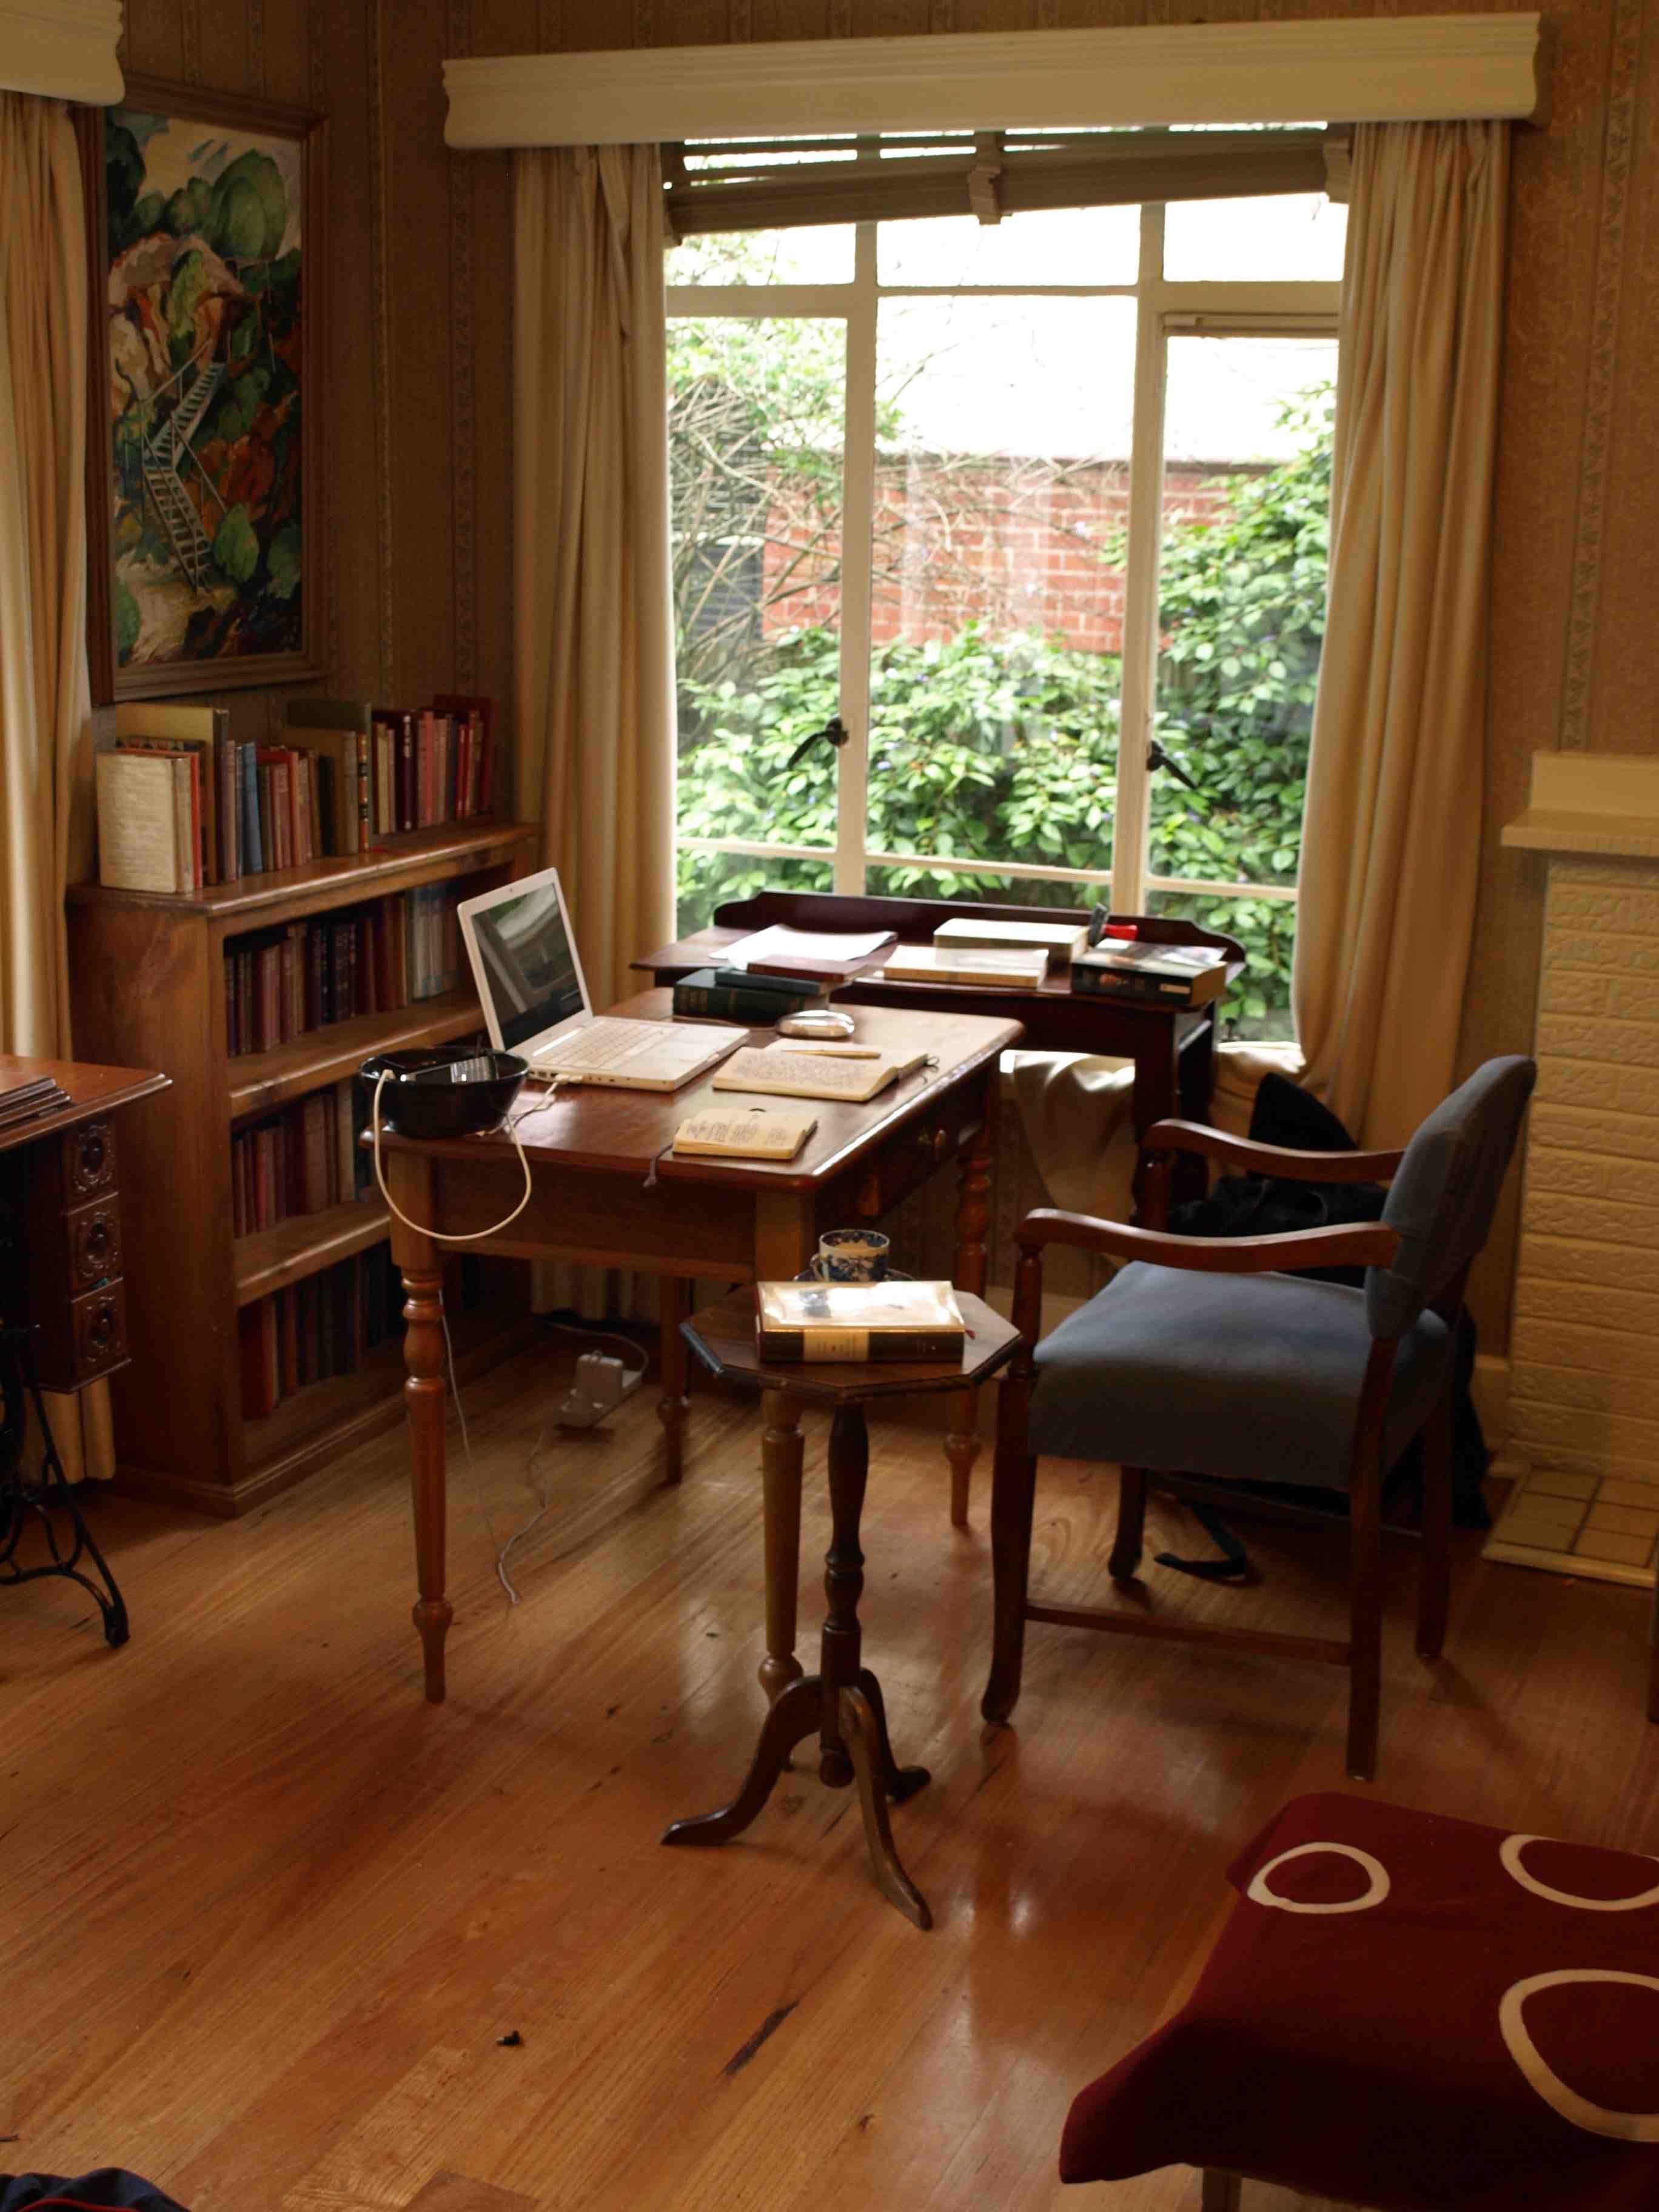 Olkd Study Room: Amandaonwriting: A Writer's Room